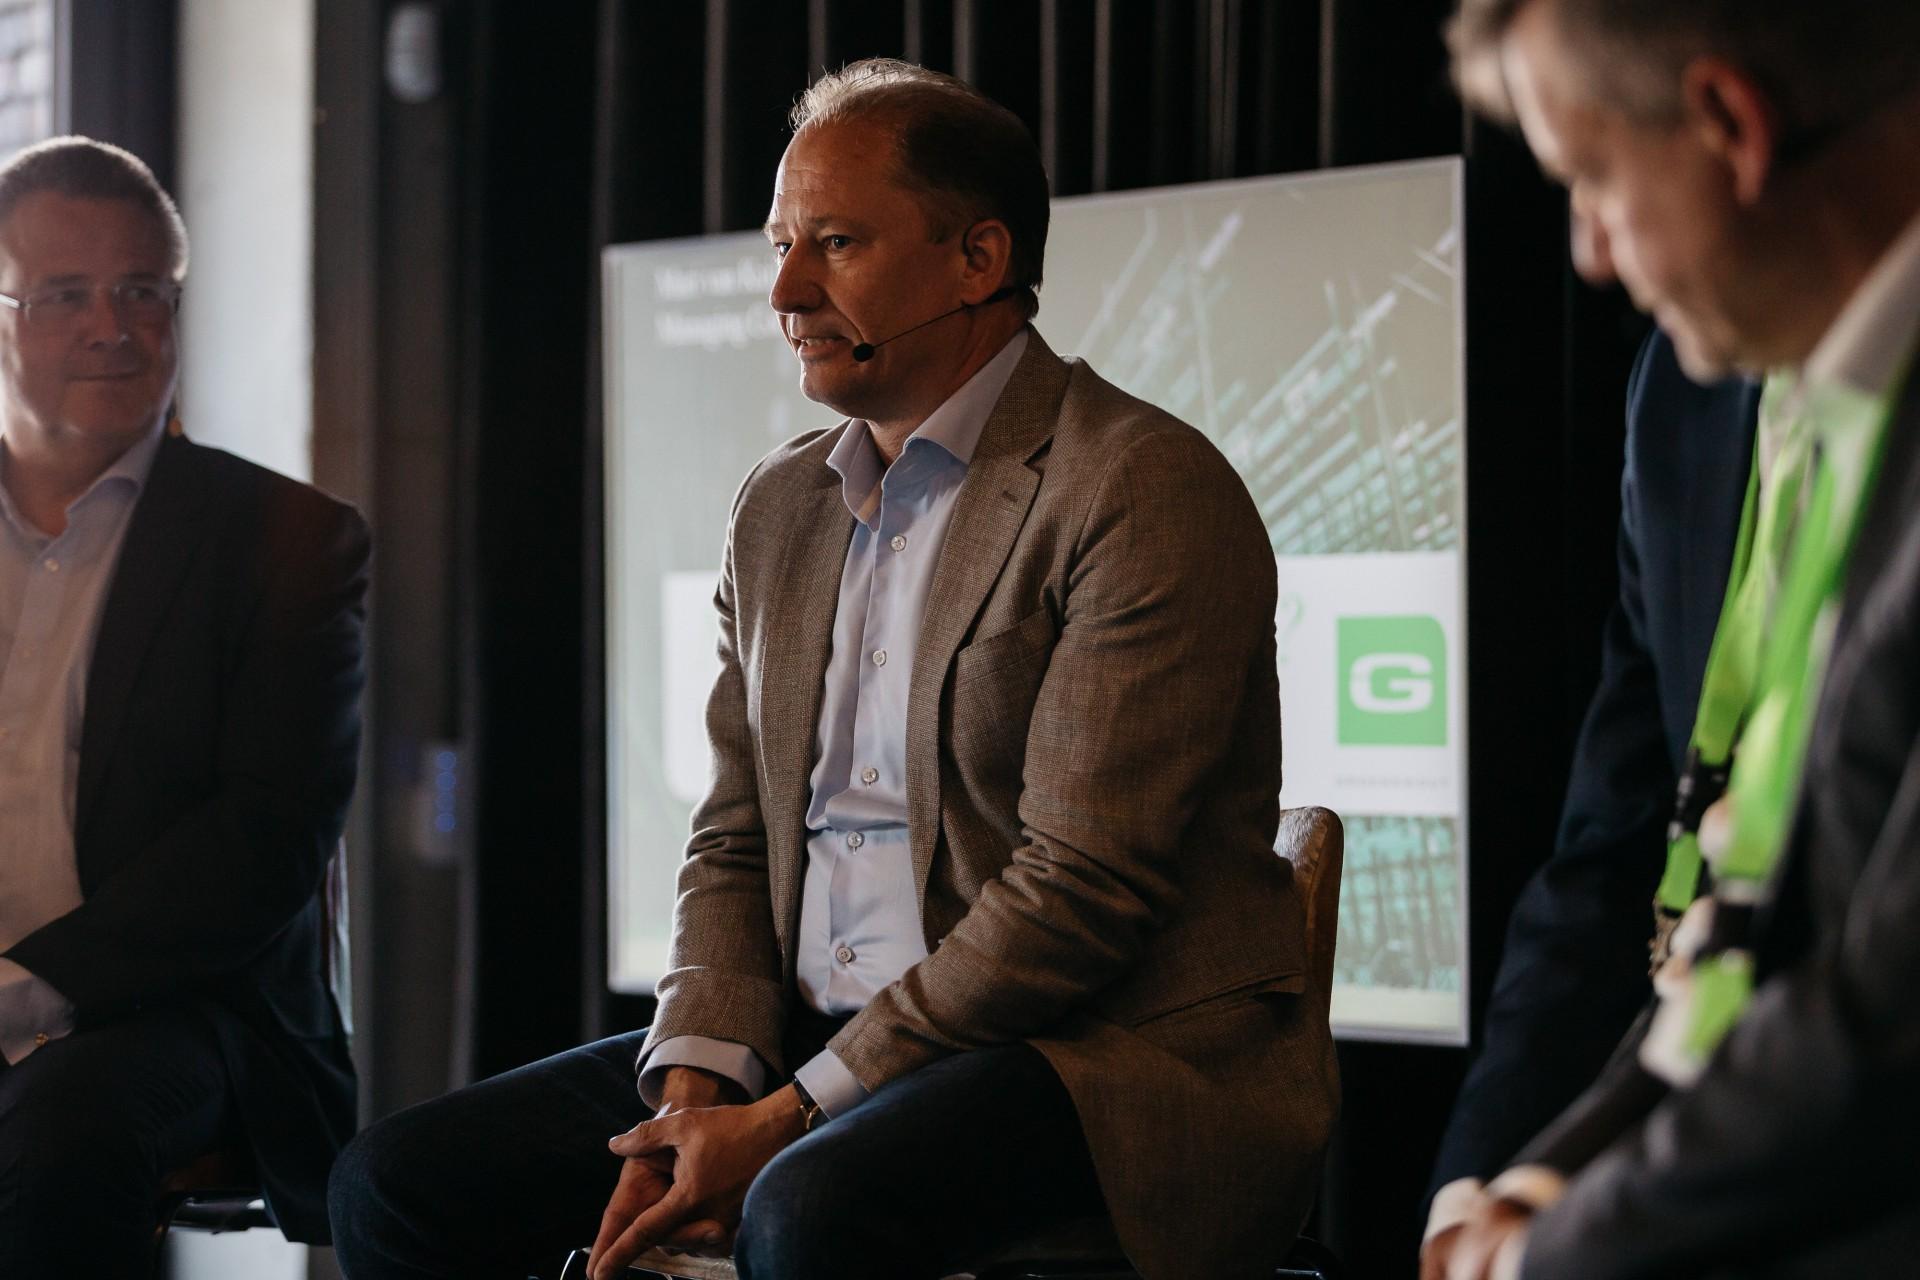 Gerwin Vos, Somerset Capital Partners